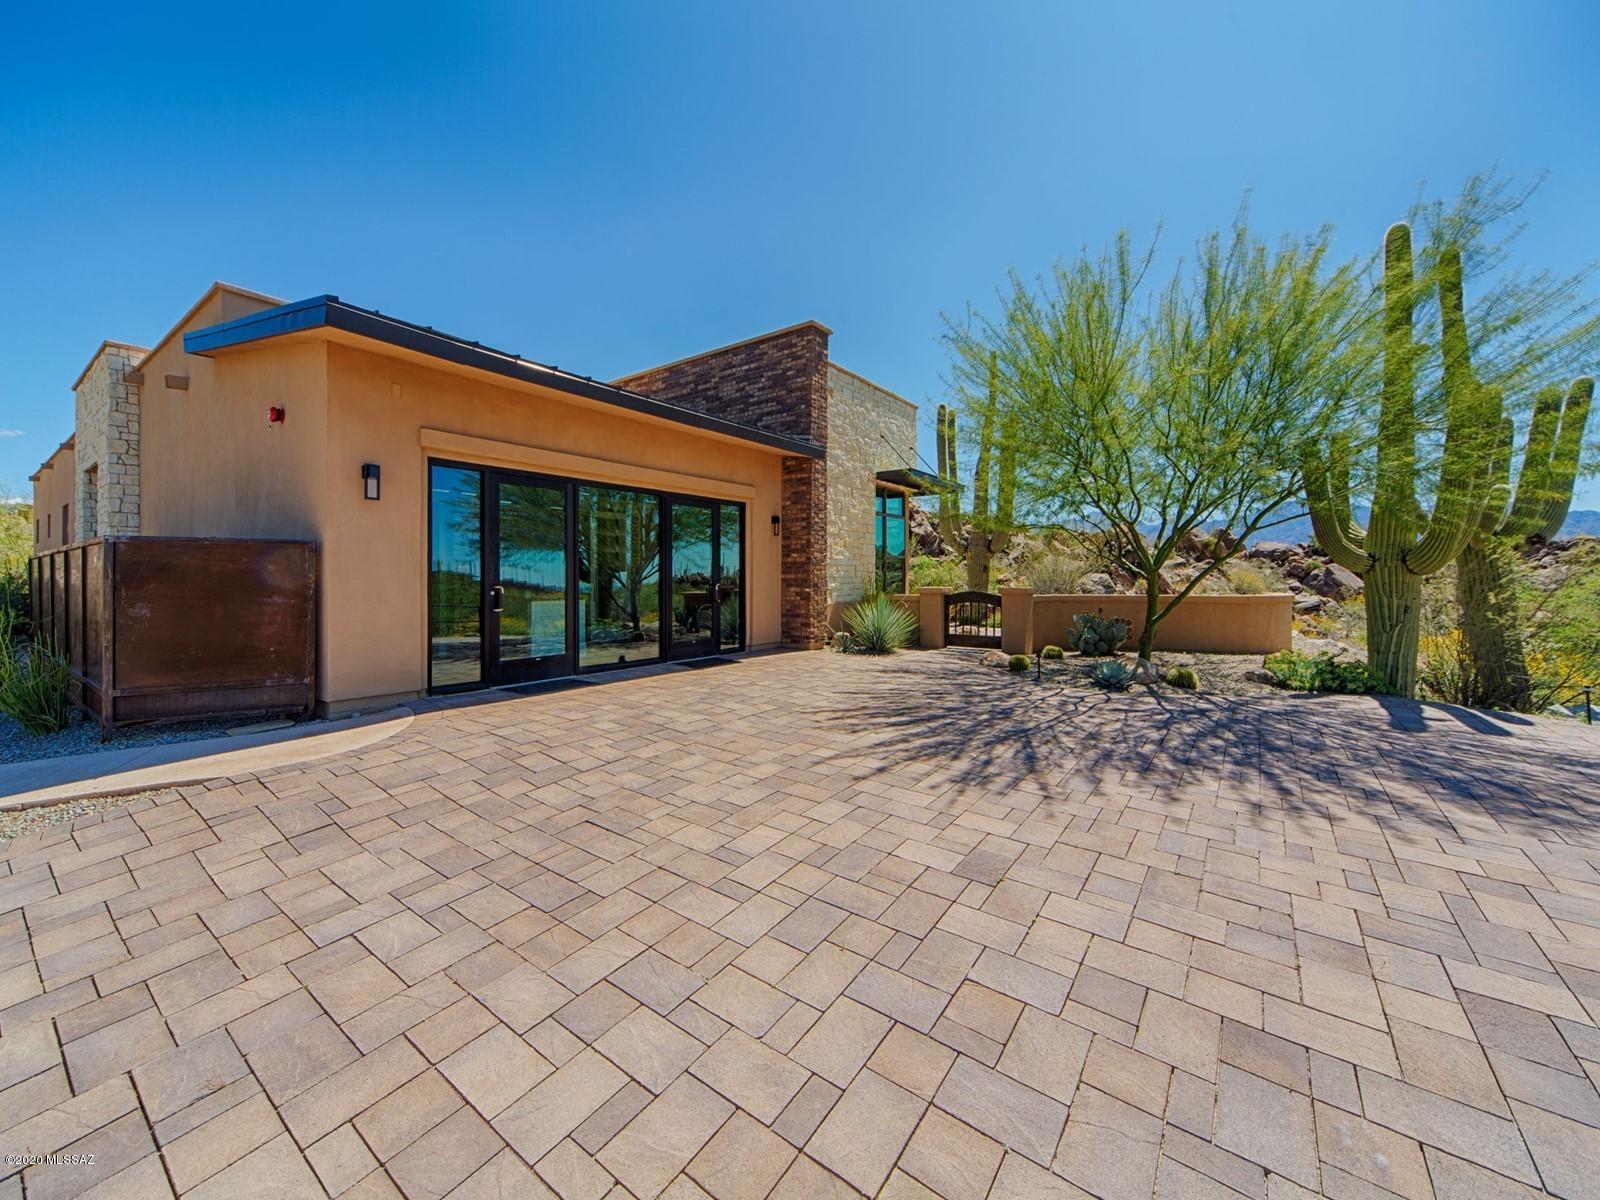 Photo of 14200 N Stone View Place, Oro Valley, AZ 85755